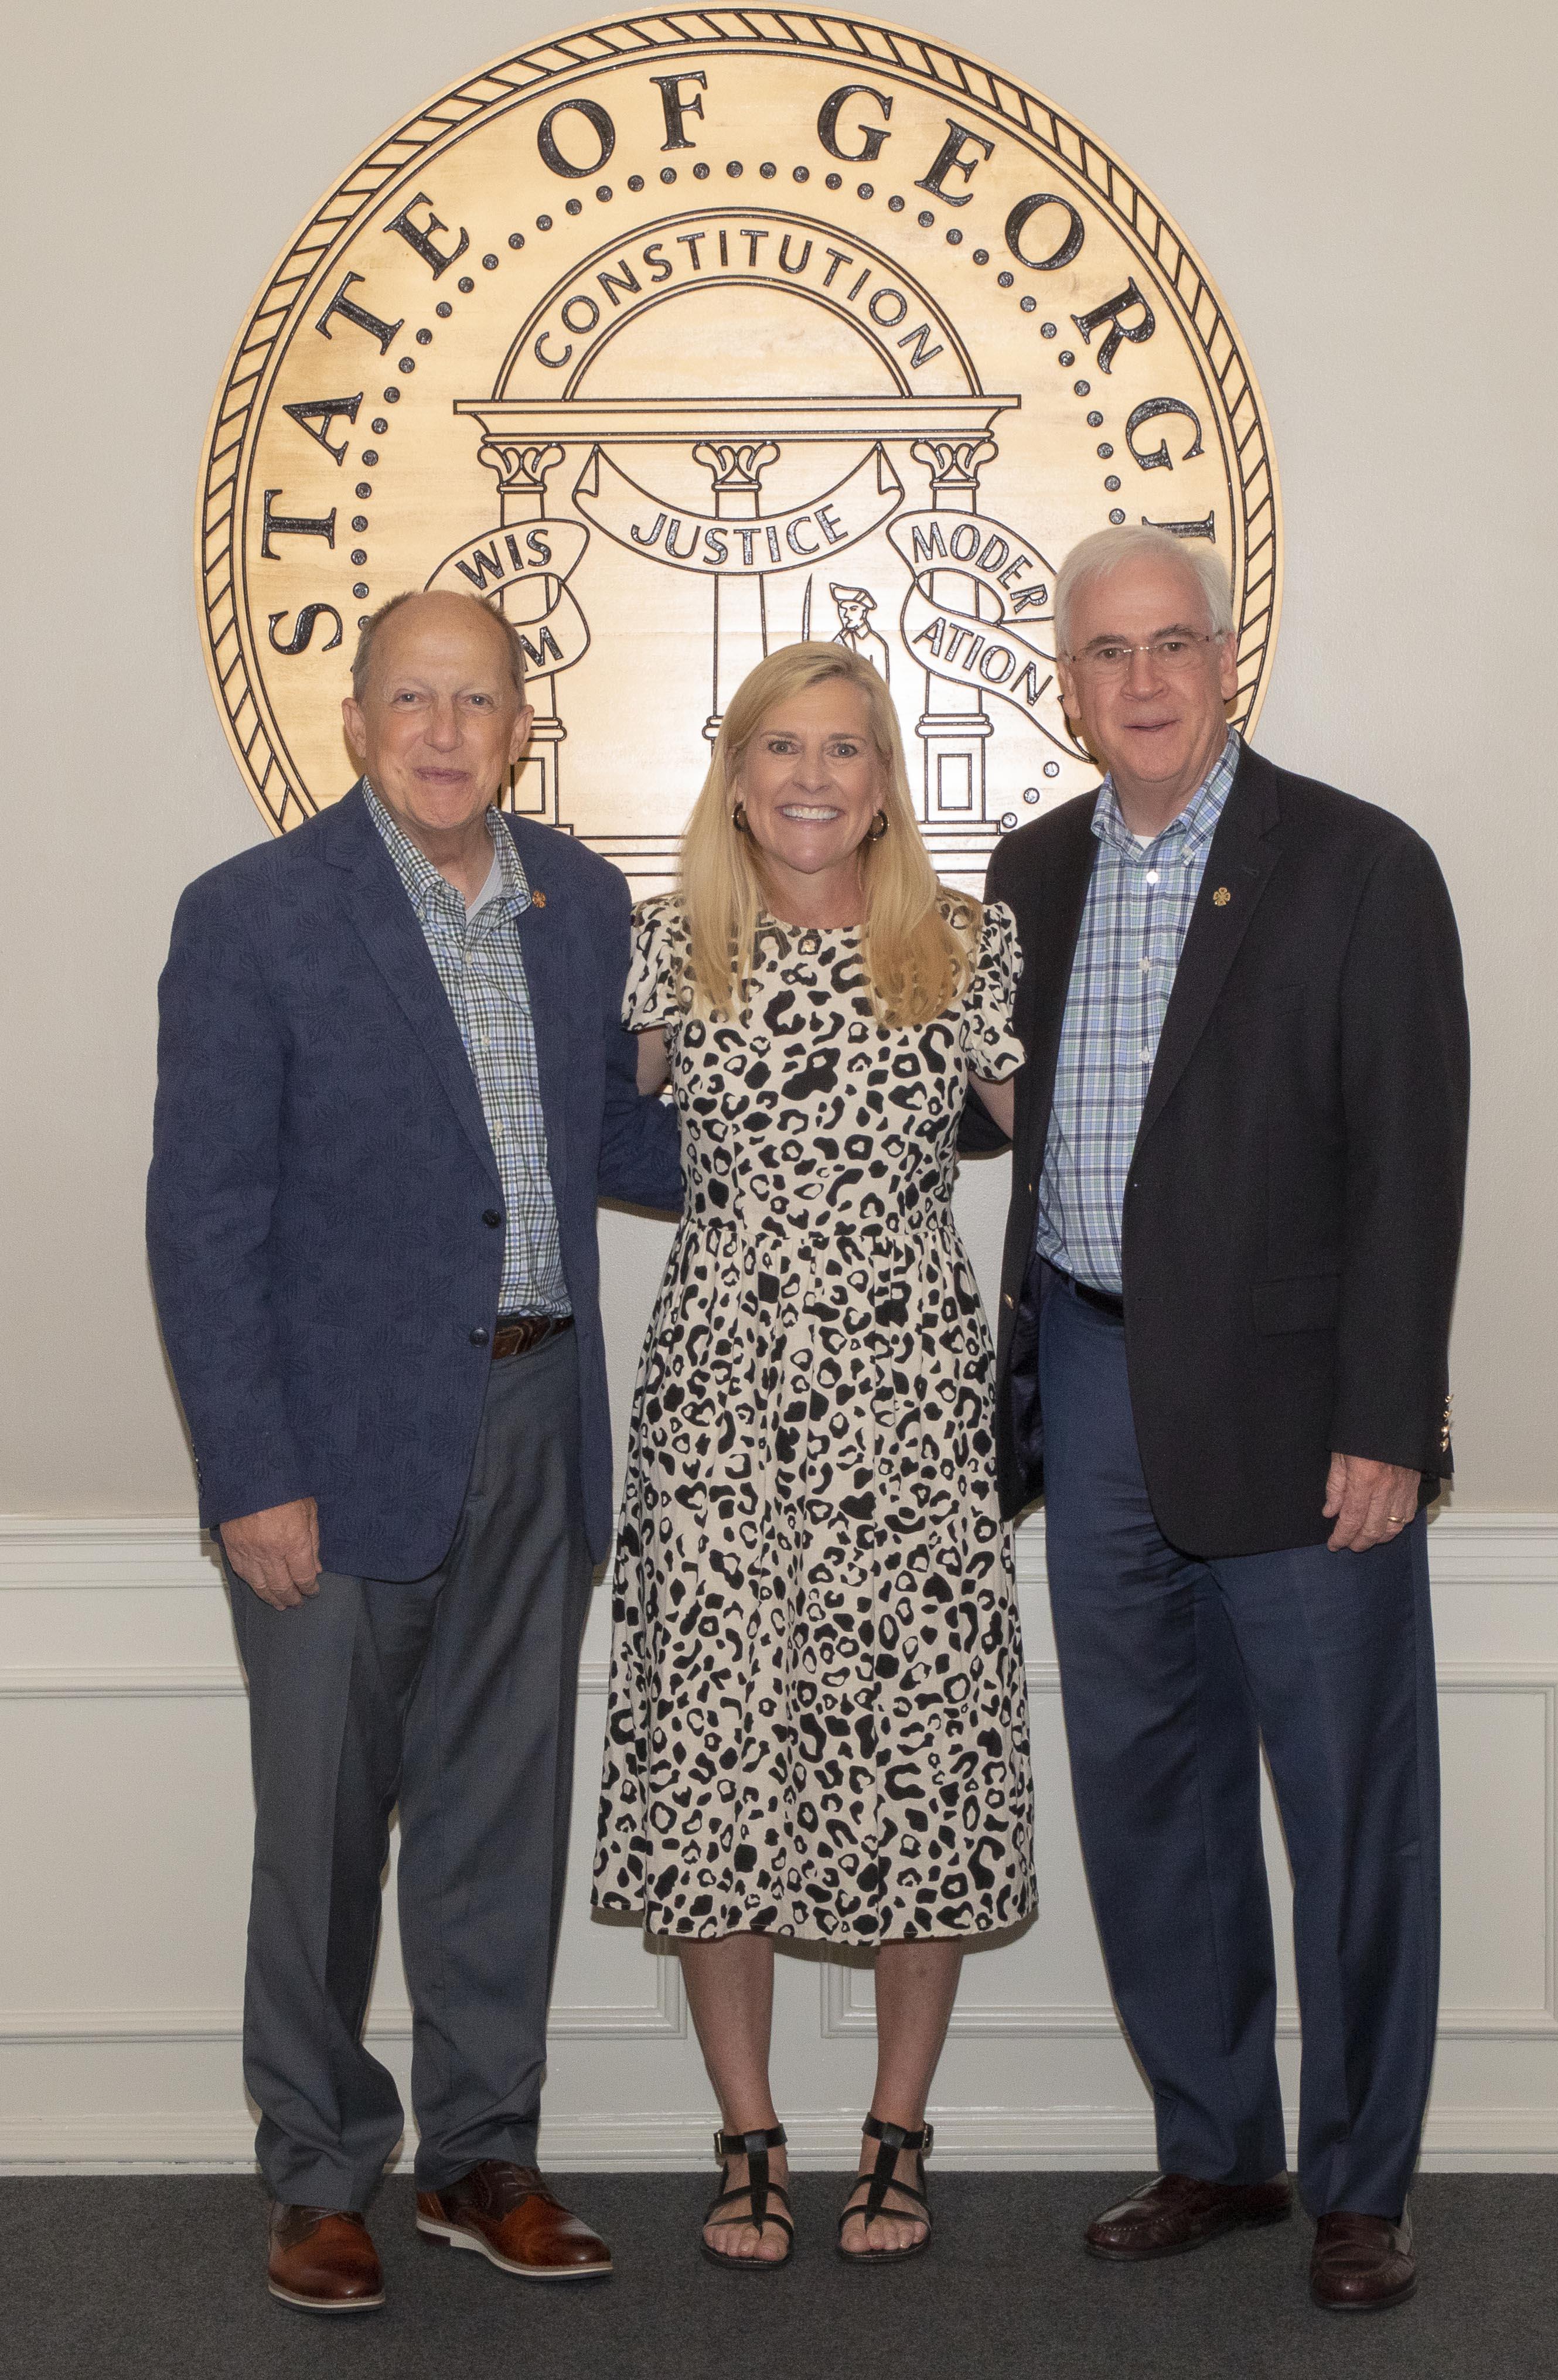 Bo Ryles, Marty Kemp and Arch Smith